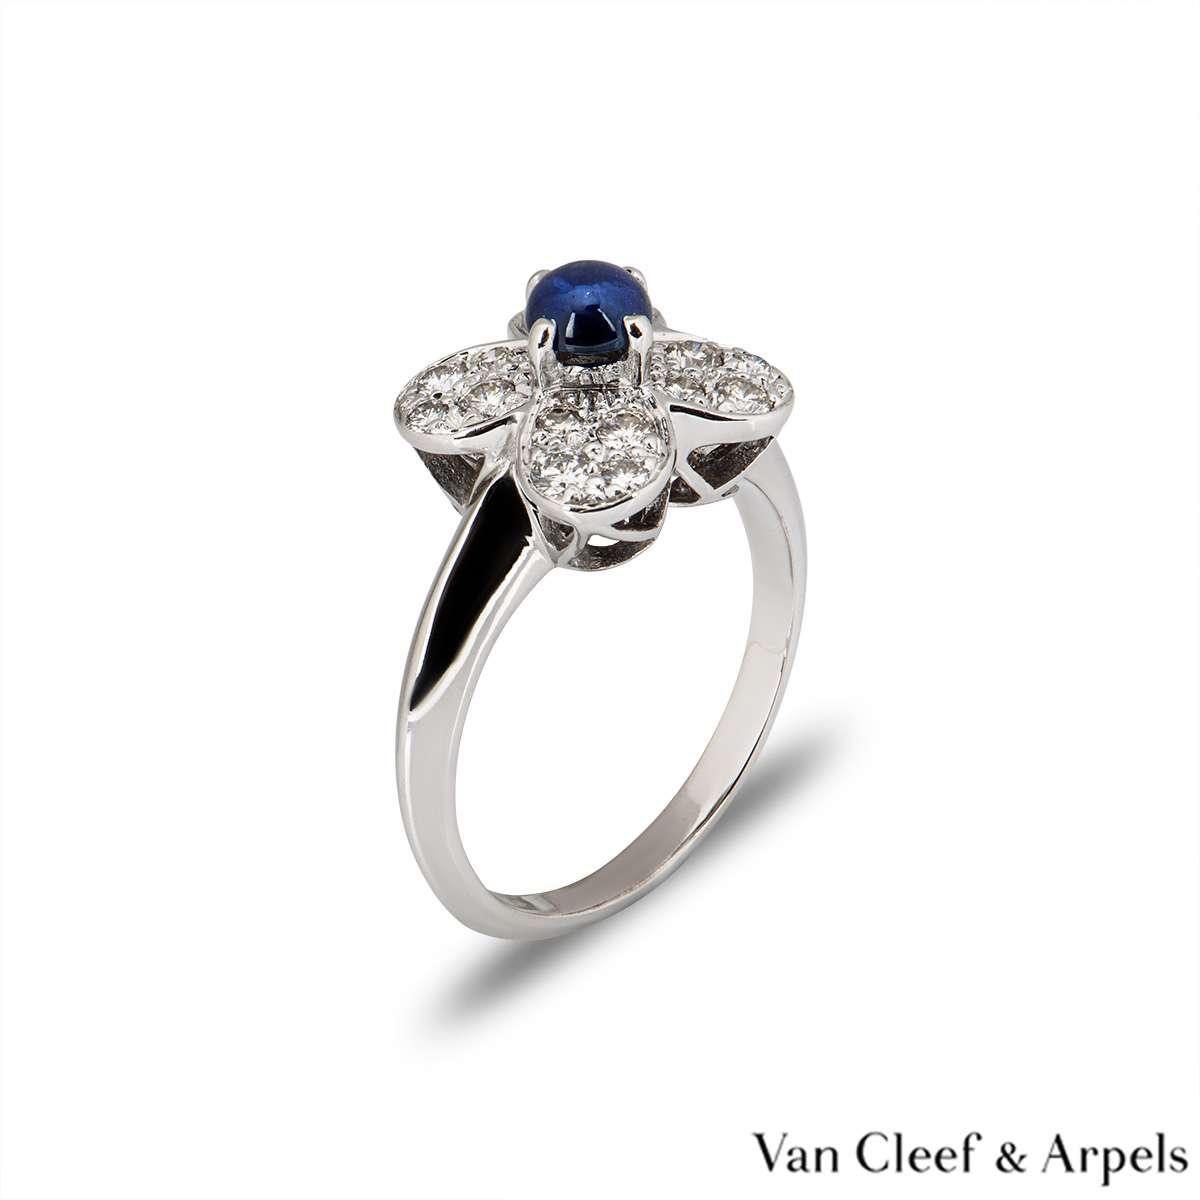 Van Cleef & Arpels White Gold Sapphire & Diamond Trefle Ring